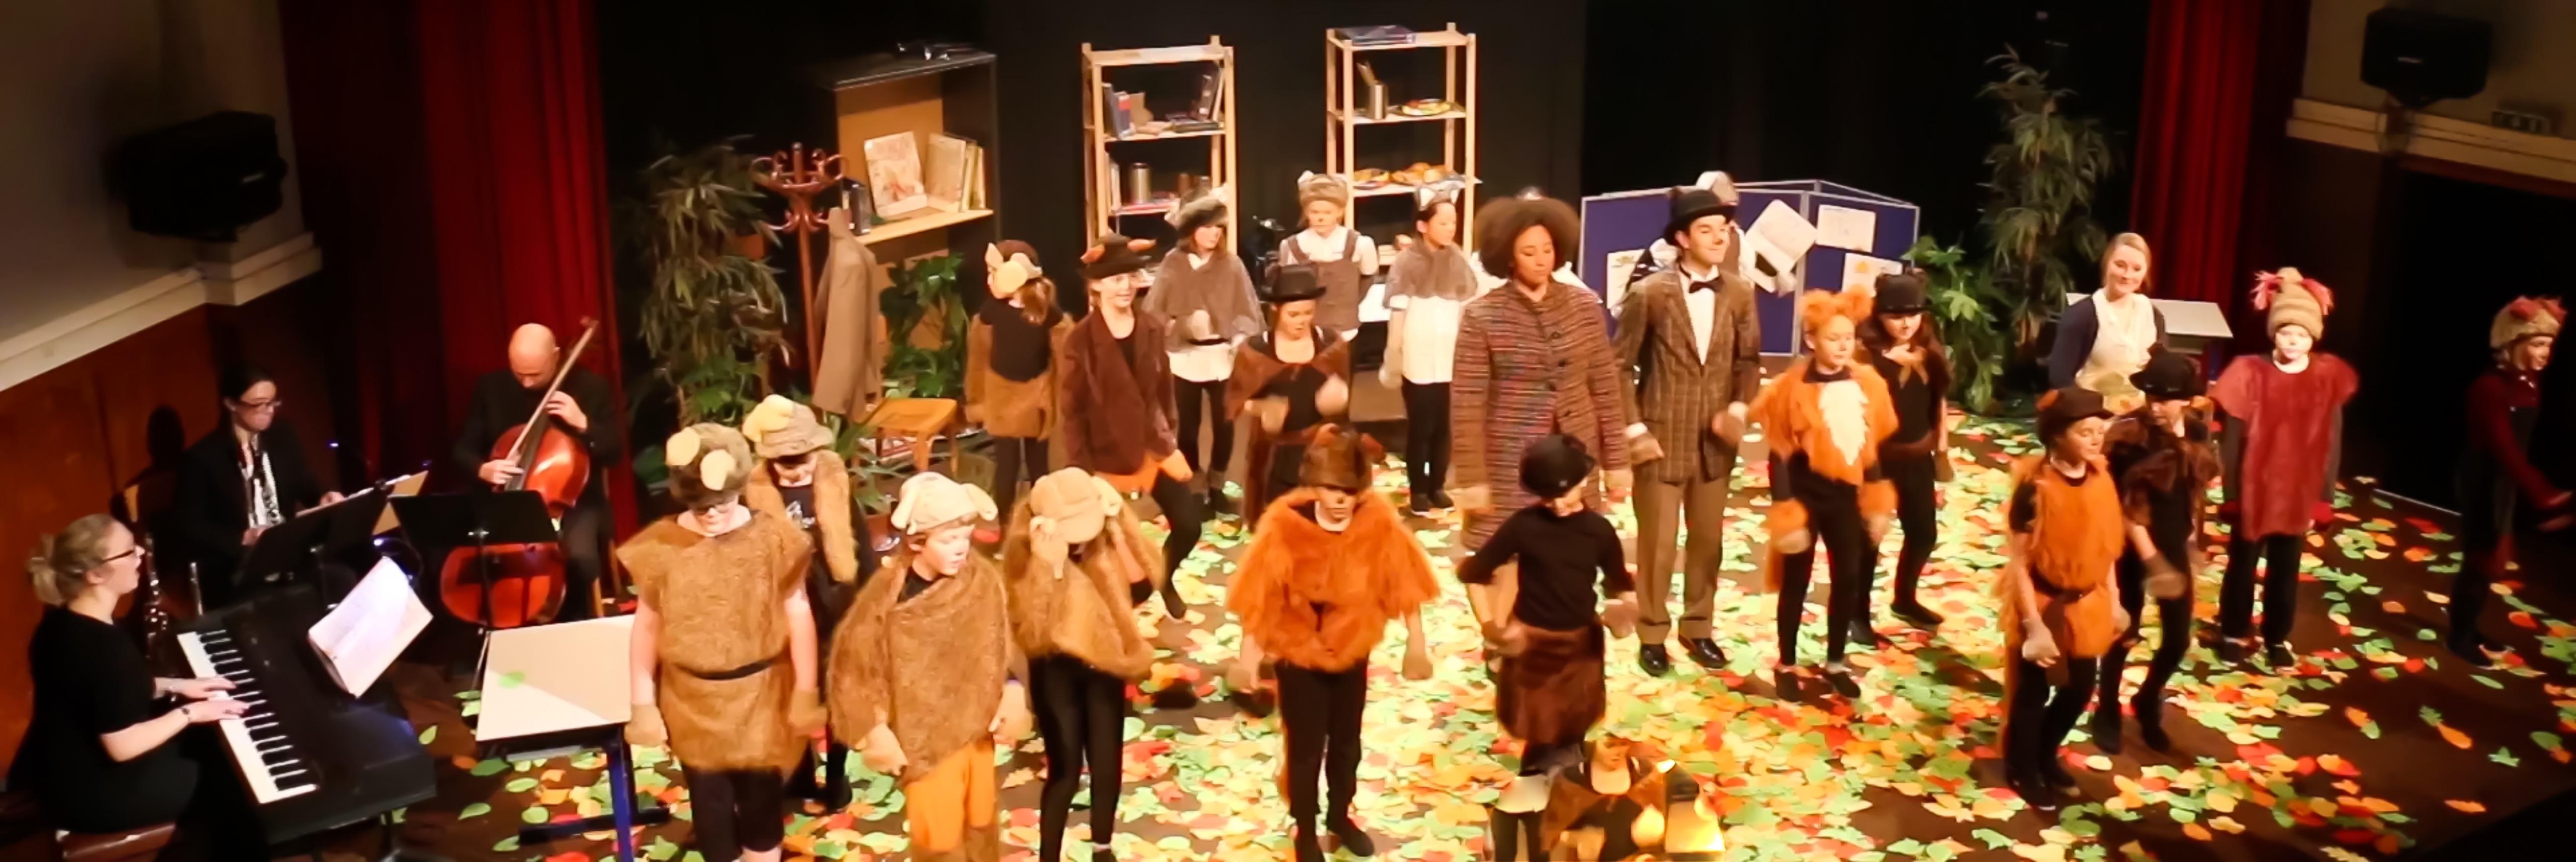 Performing Arts Hedgehog's Home